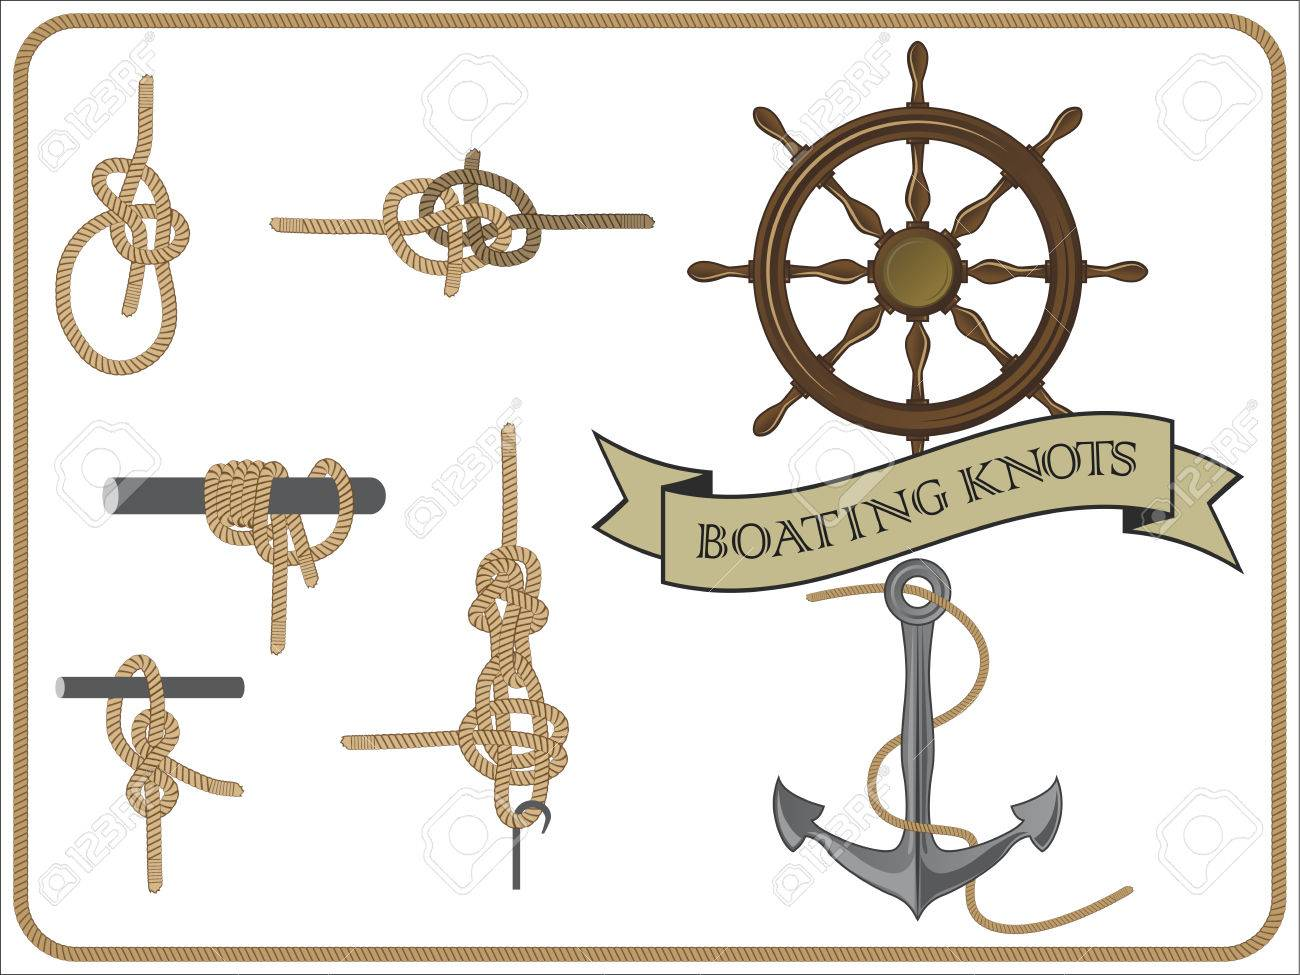 isolated set of boating knots on white background - 74269544